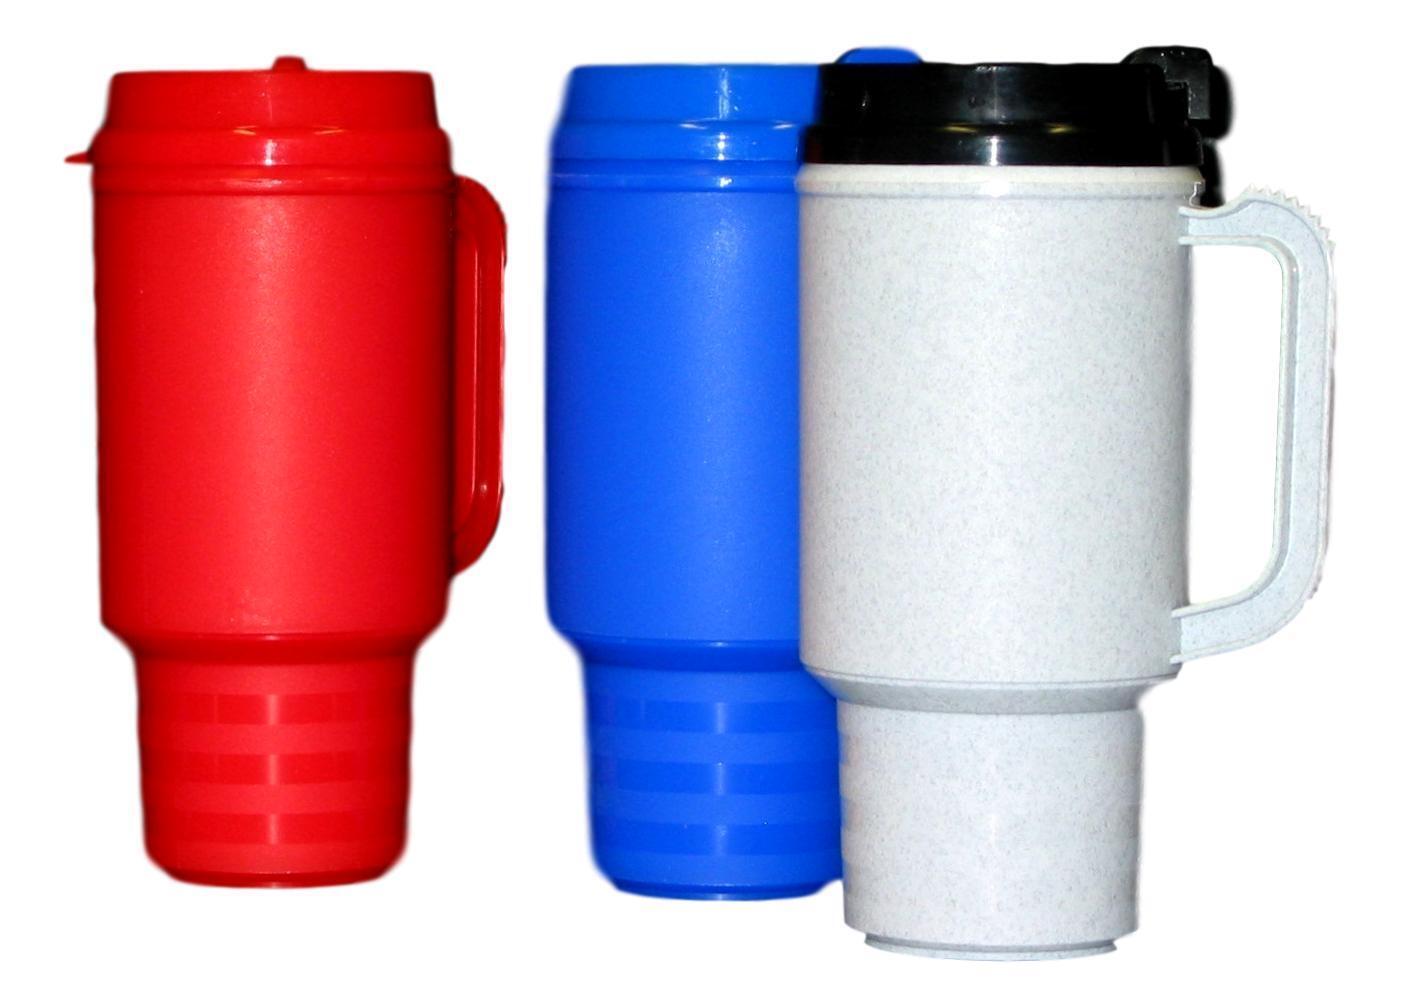 3 Coffee Travel Mugs Holds 18 Oz 1 ea Granite Red & bluee Air Insulated Mfg USA